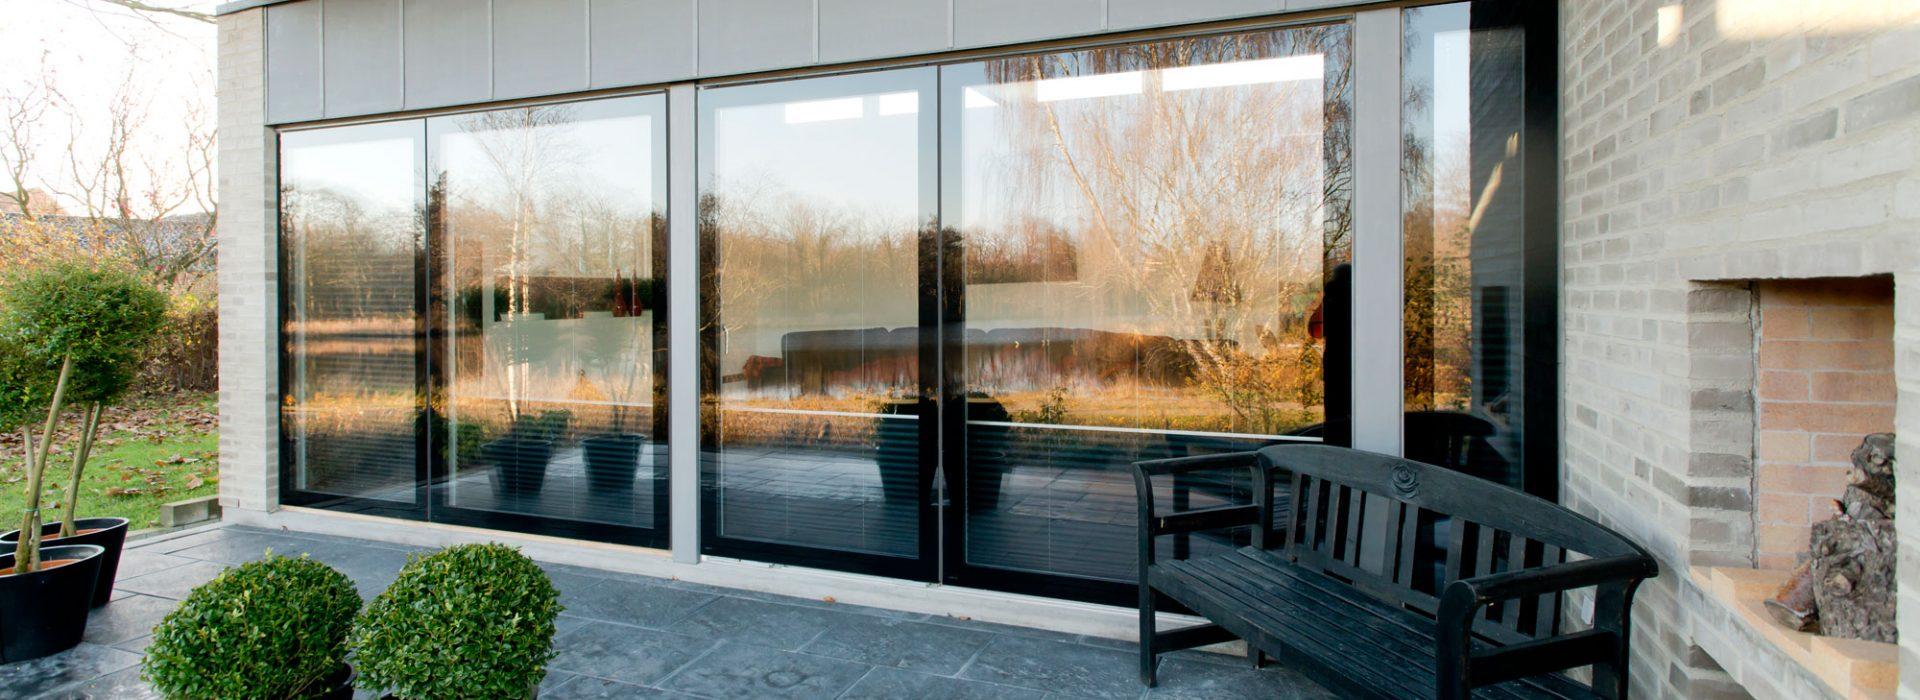 Svarre-vinduer-heltglass-mesterbygg-slide